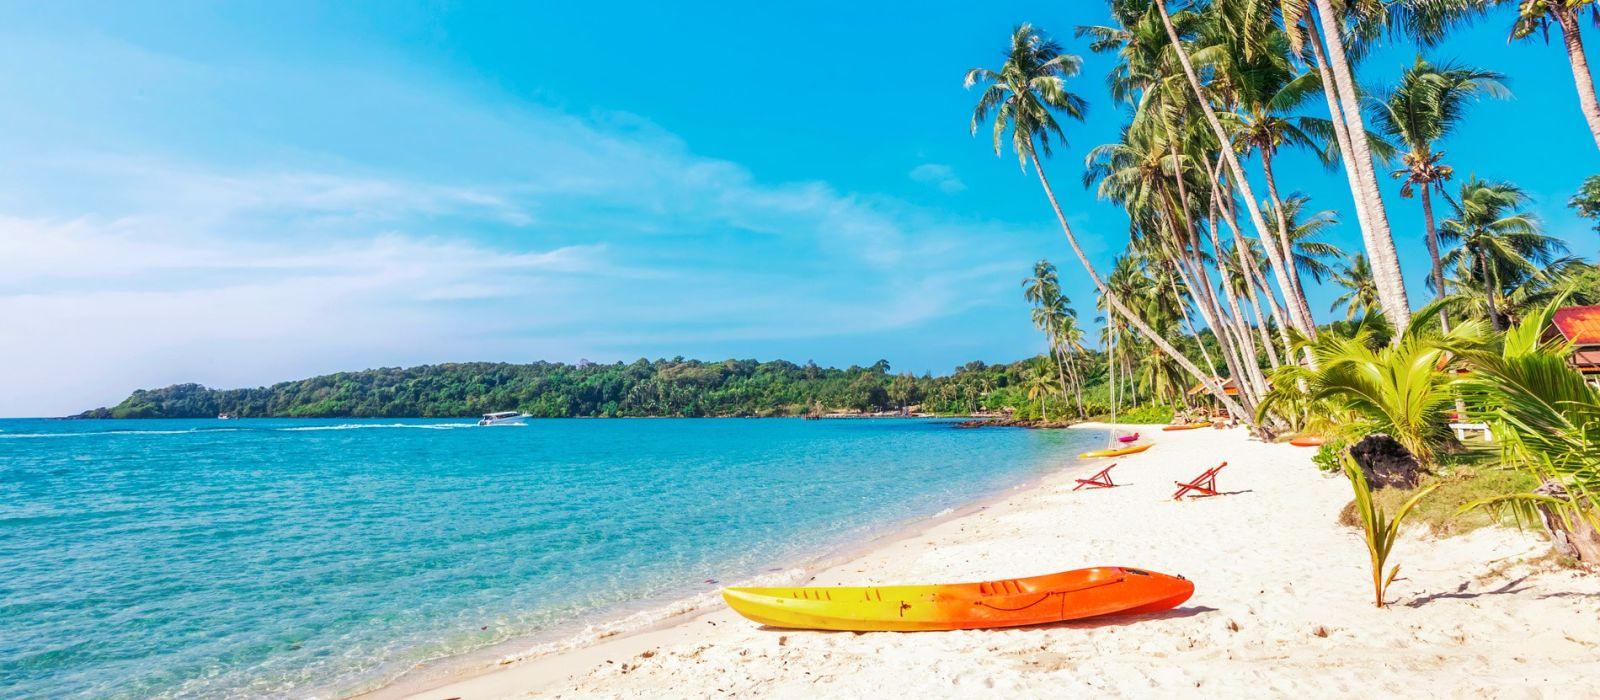 Destination Phu Quoc Island Vietnam